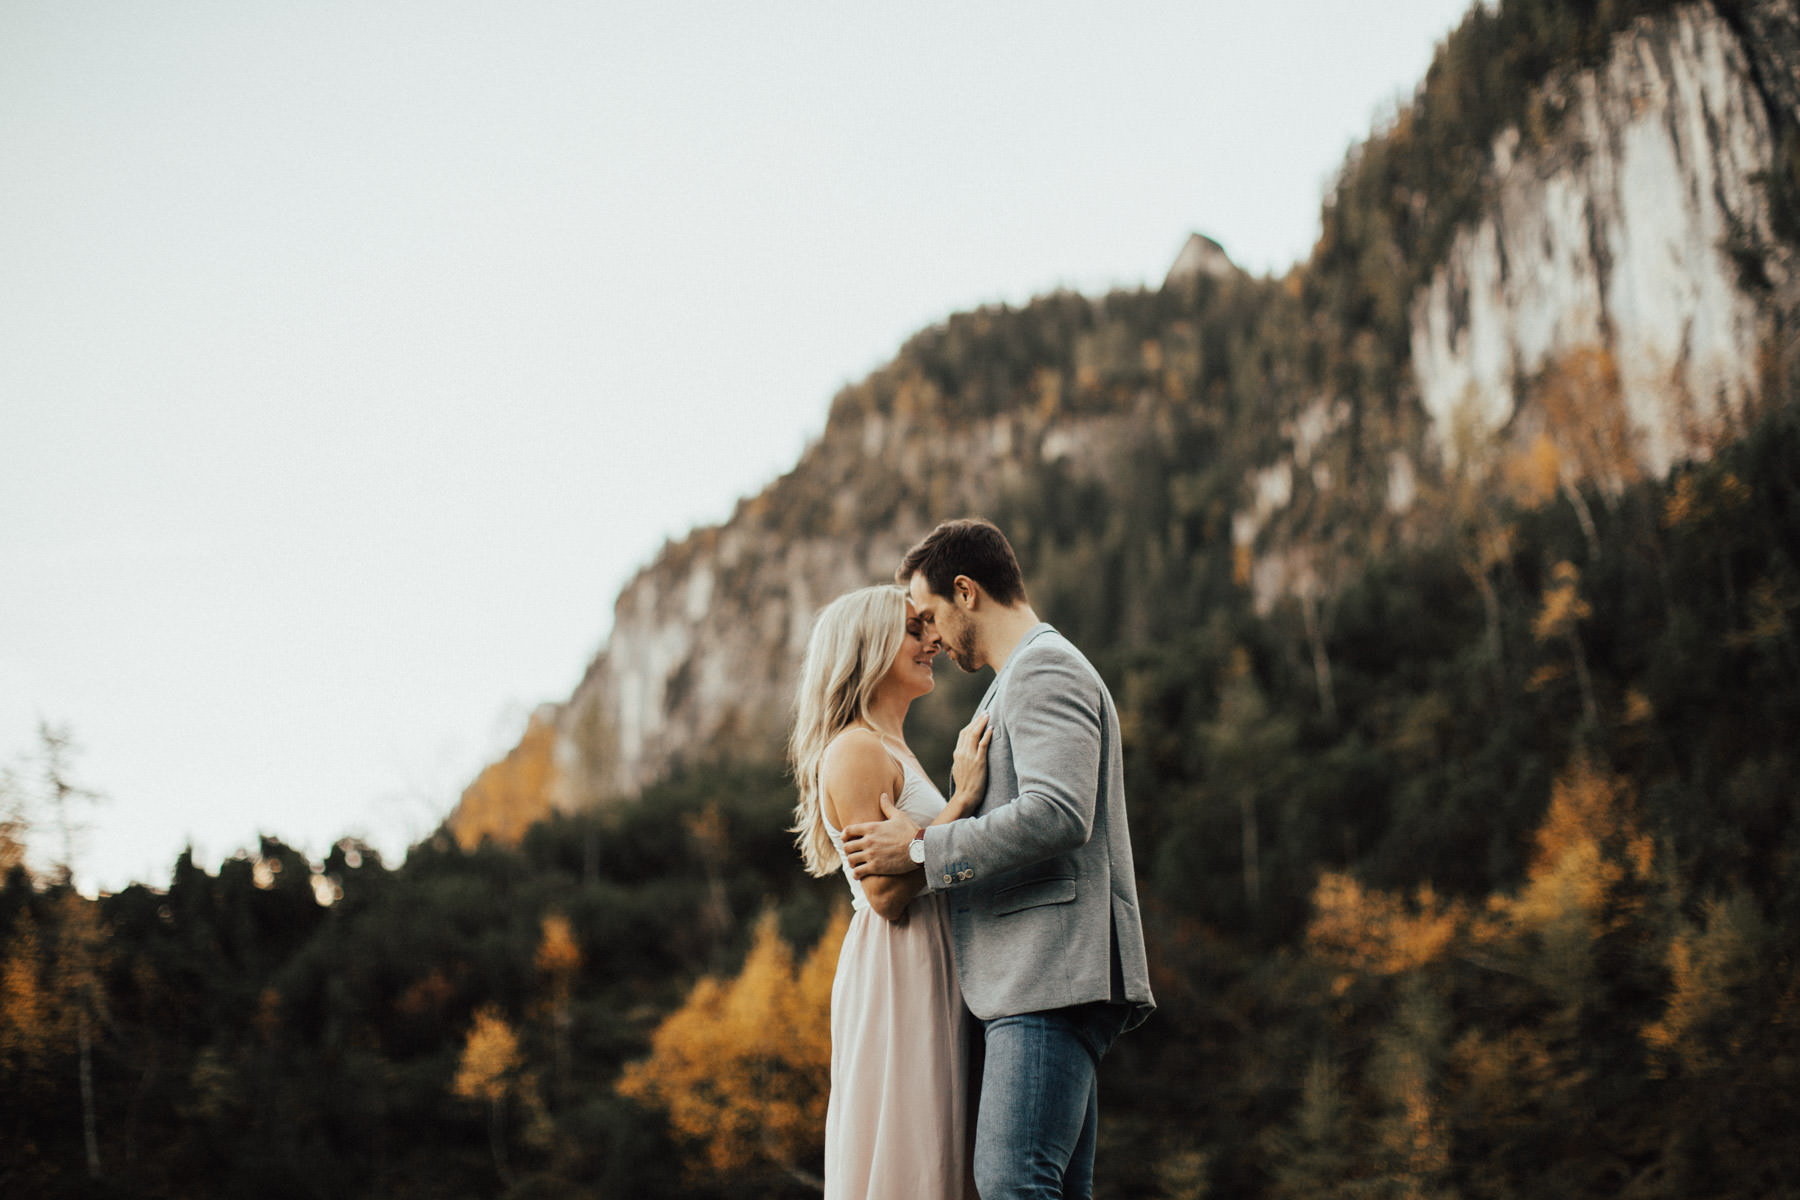 küssendes Paar vor wunderschöner Landschaft